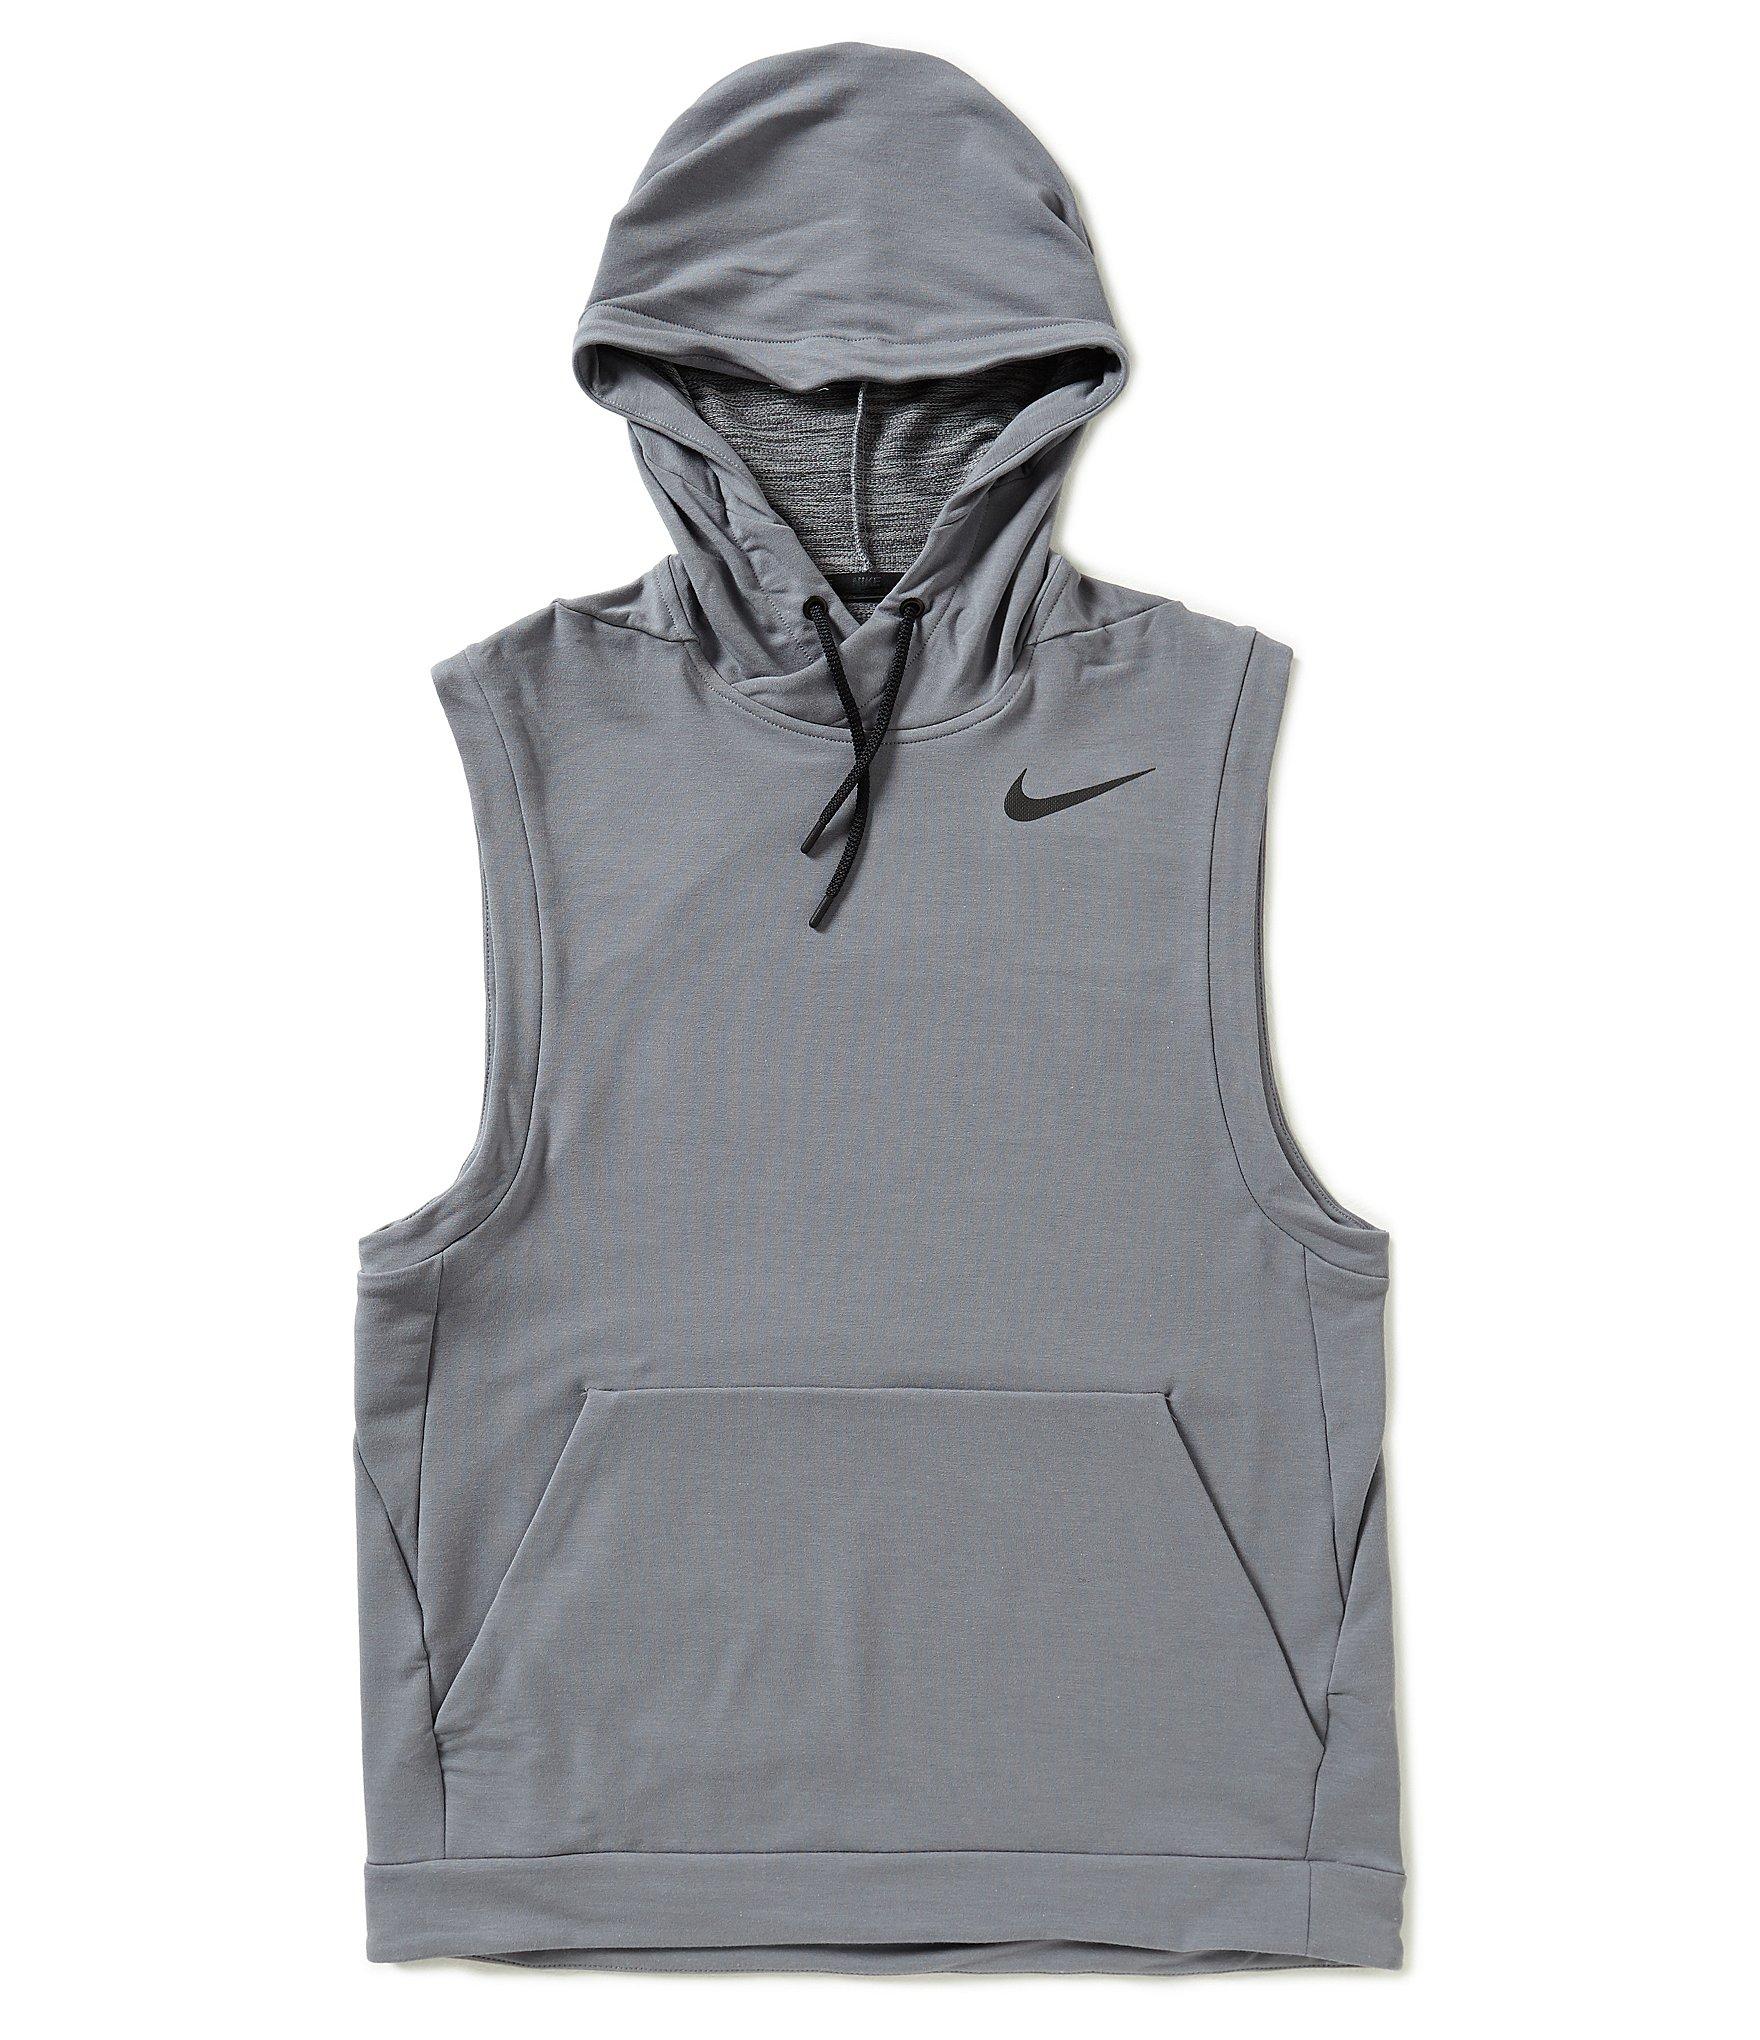 Cool sleeveless hoodies